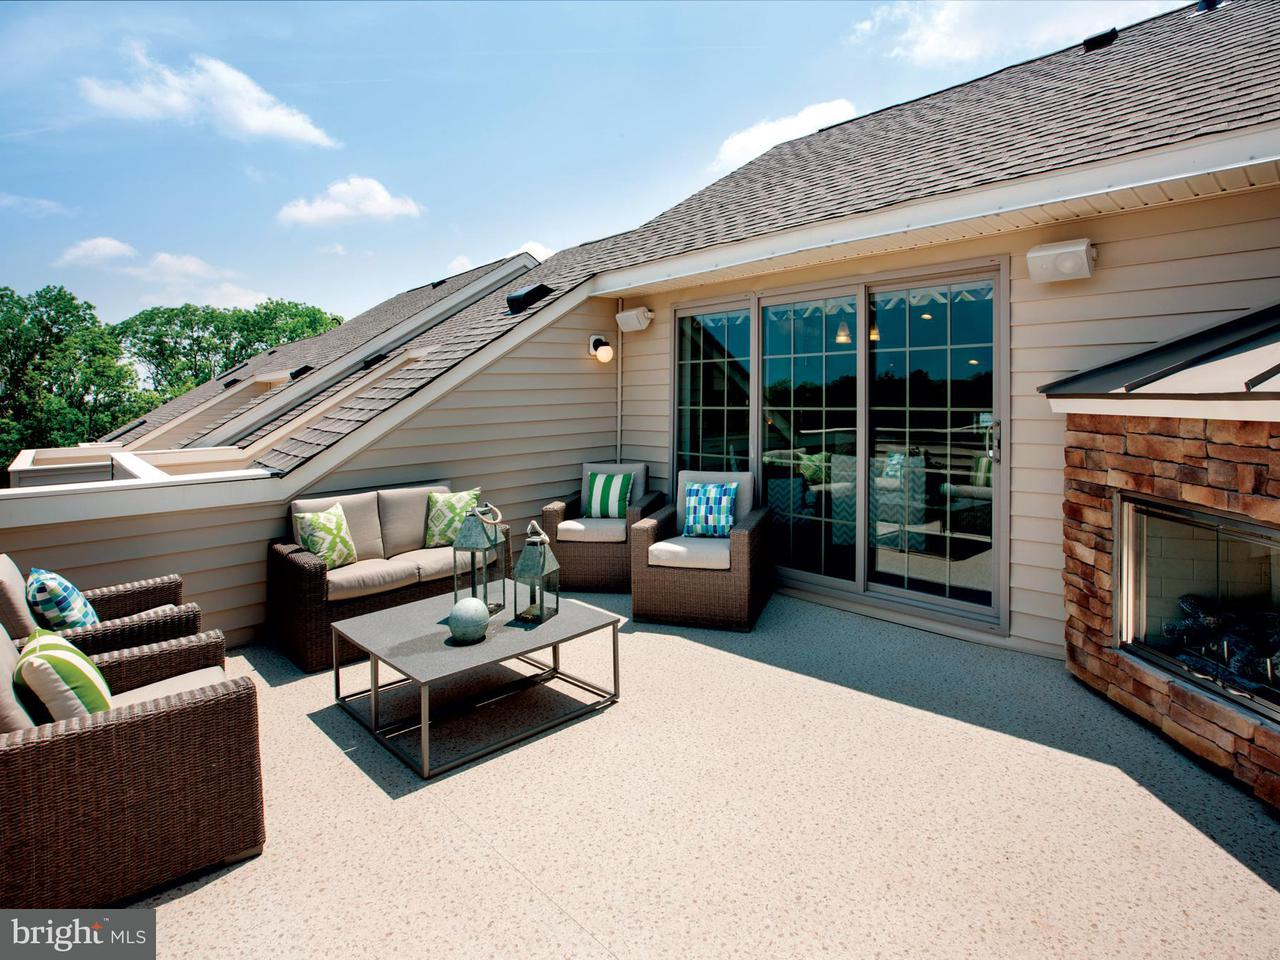 Additional photo for property listing at 22639 NORWALK SQ 22639 NORWALK SQ Ashburn, Virginia 20148 Stati Uniti